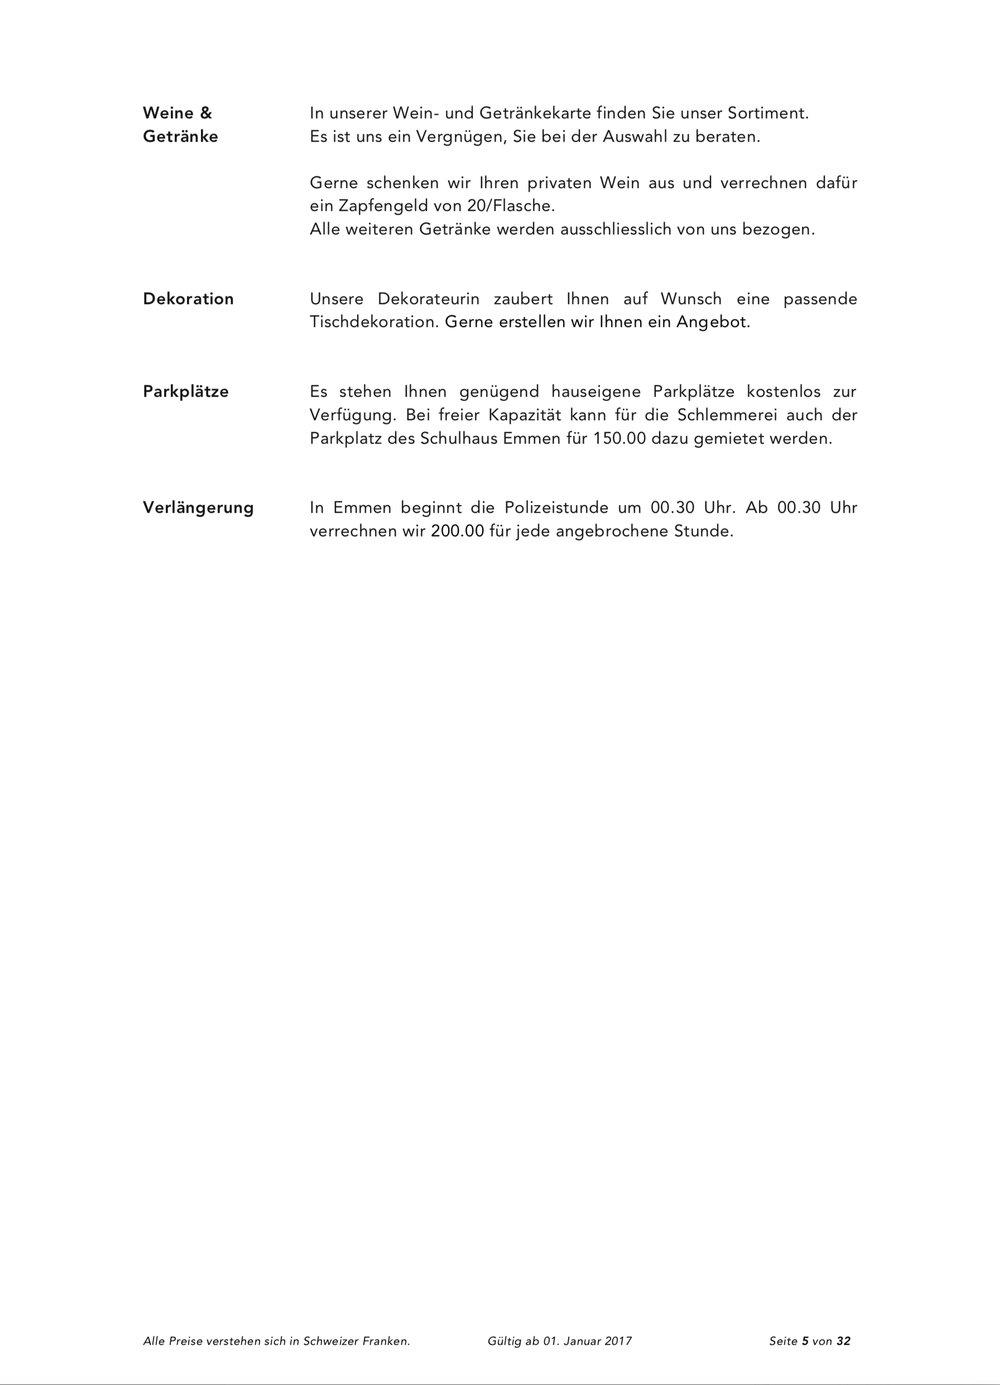 bankettdokumentation-schlemmerei-partnersingmbh-1.jpg